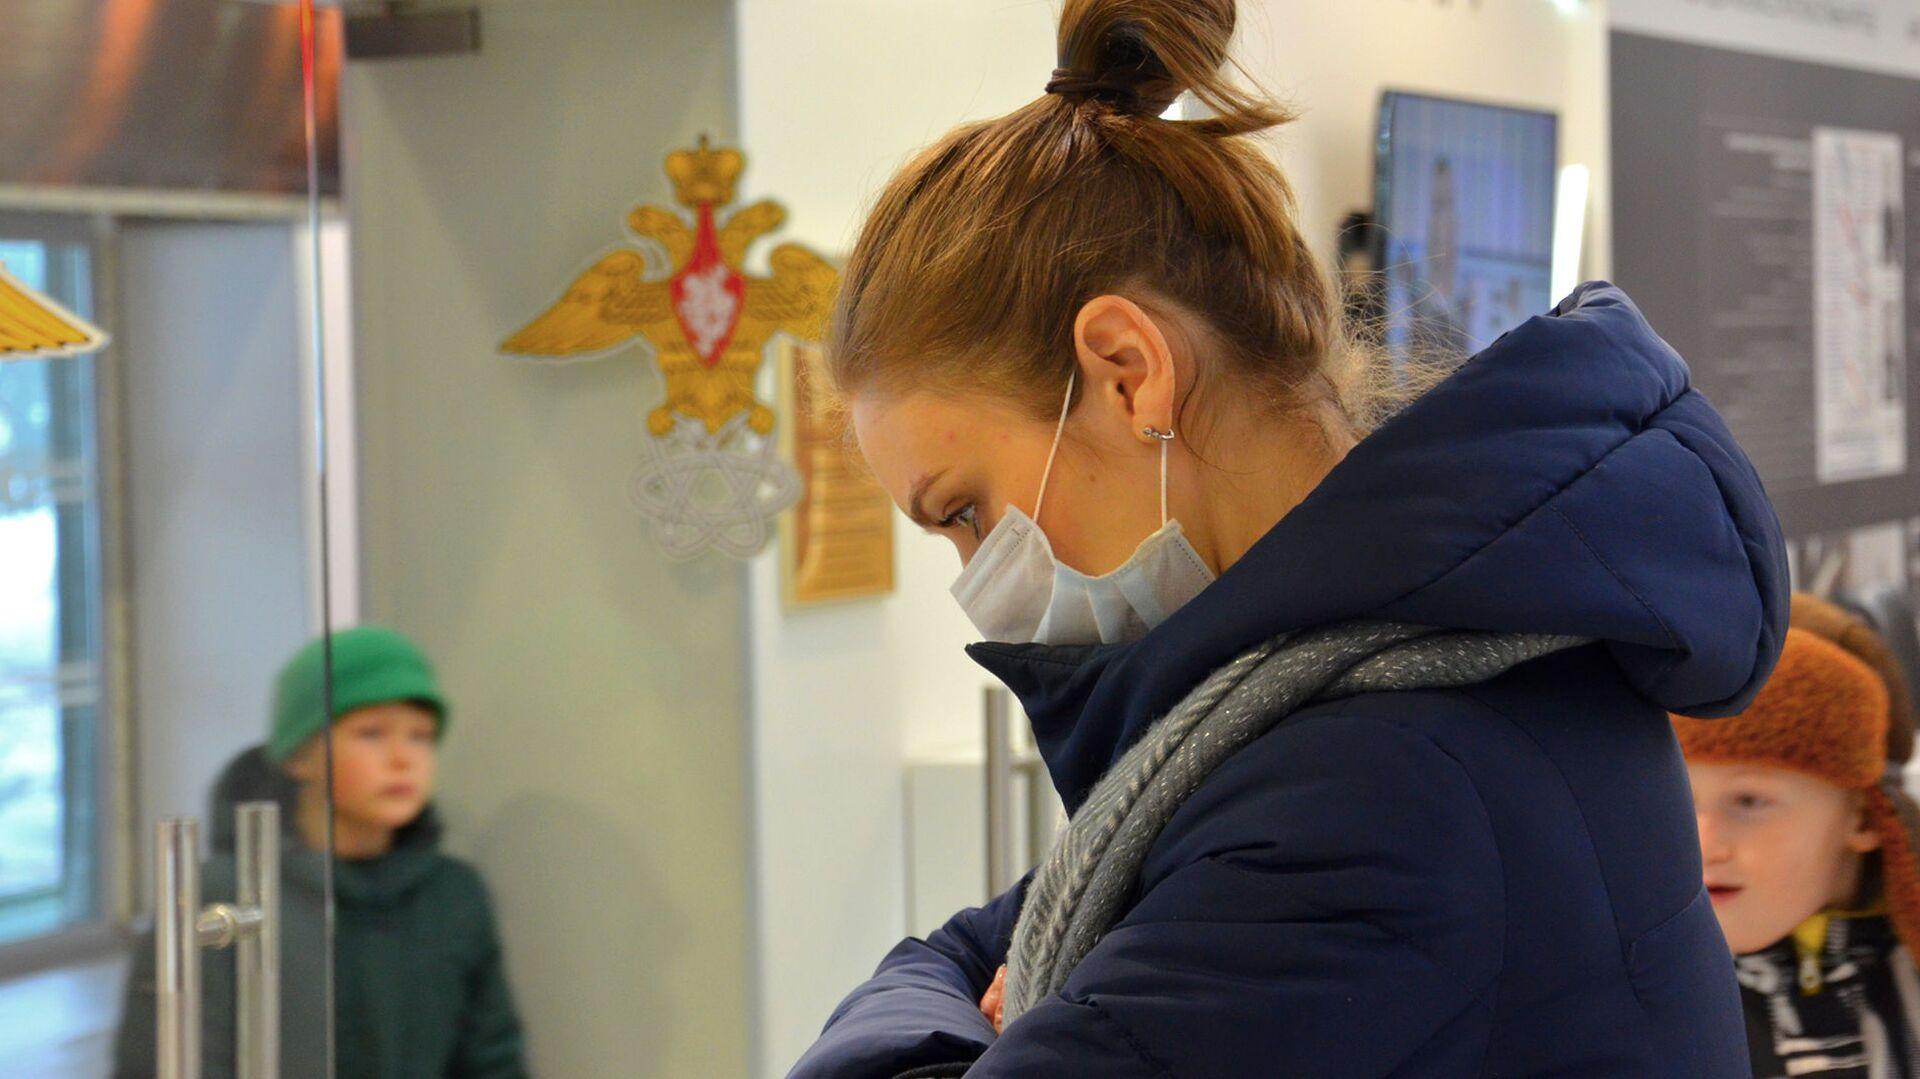 Coronavirus in Russia - Regione di Mosca, gennaio 2021 - Sputnik Italia, 1920, 31.08.2021